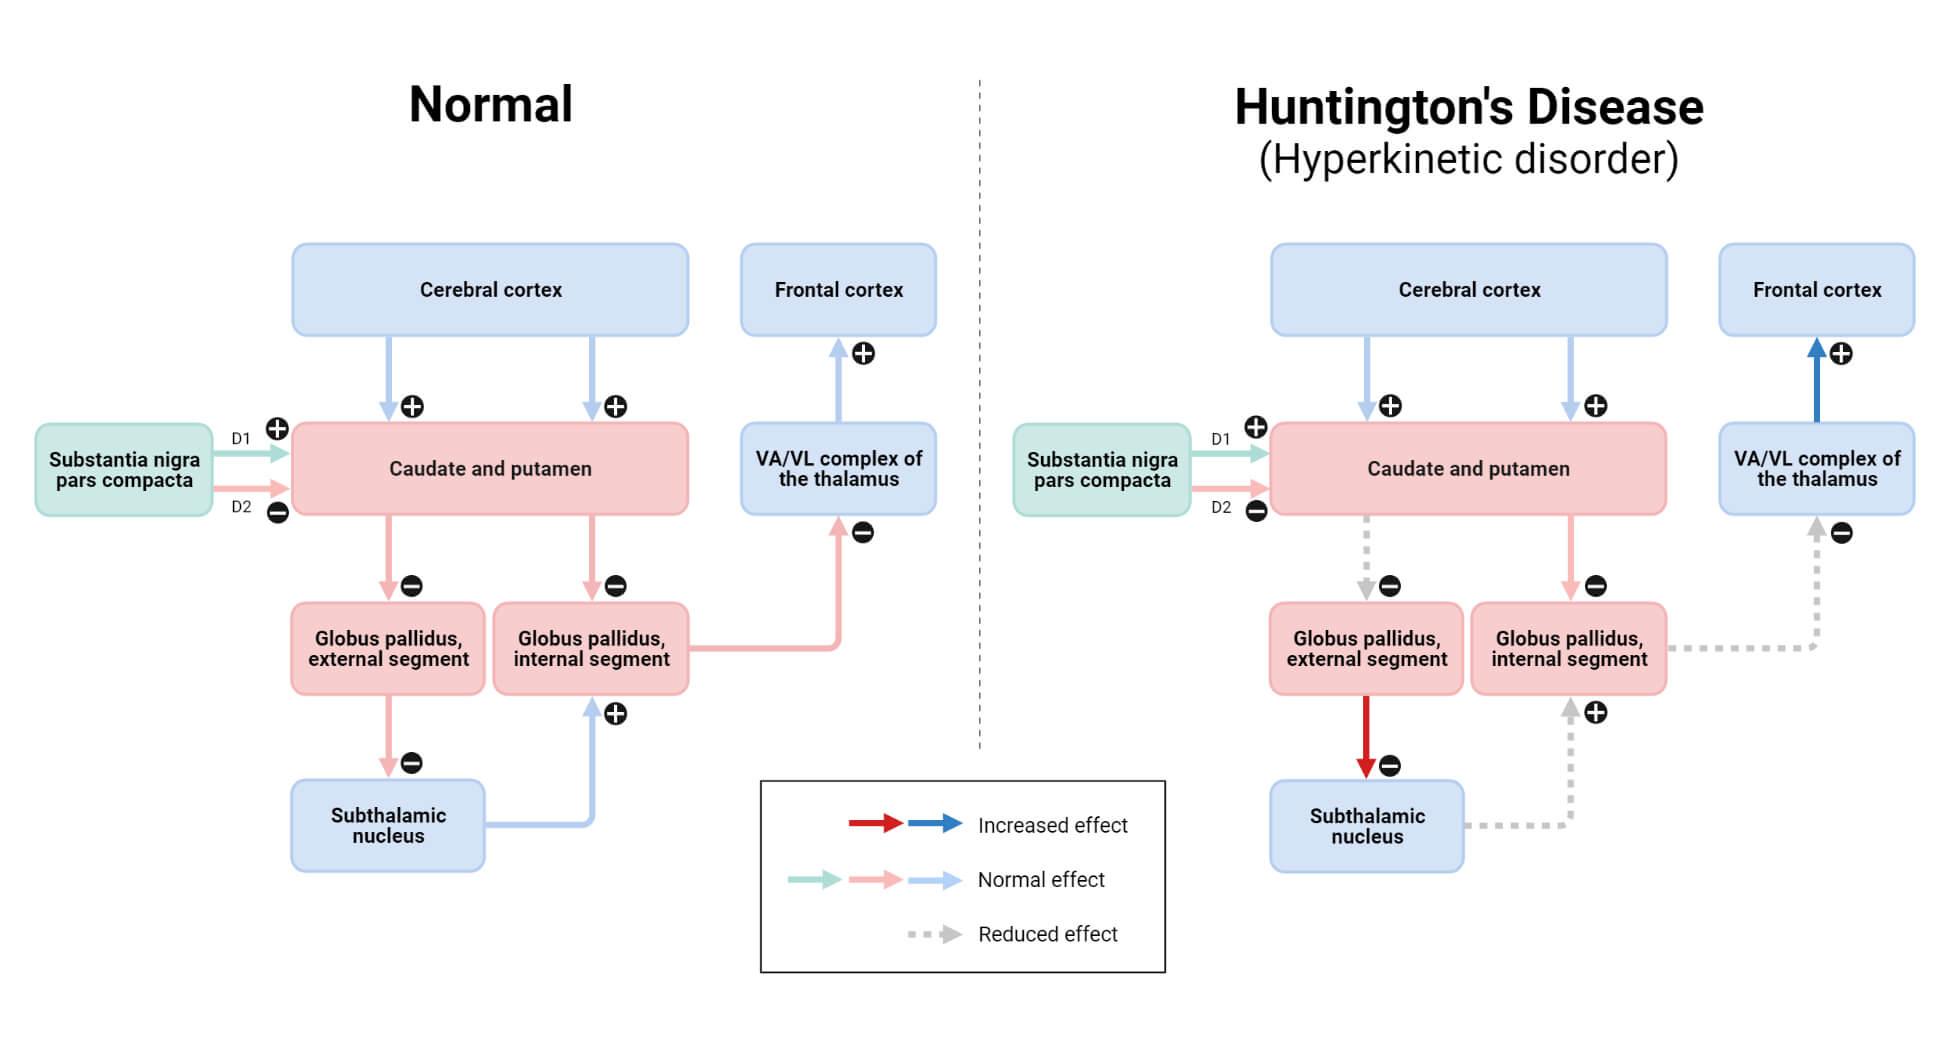 Huntington's Disease (Hyperkinetic Disorder)